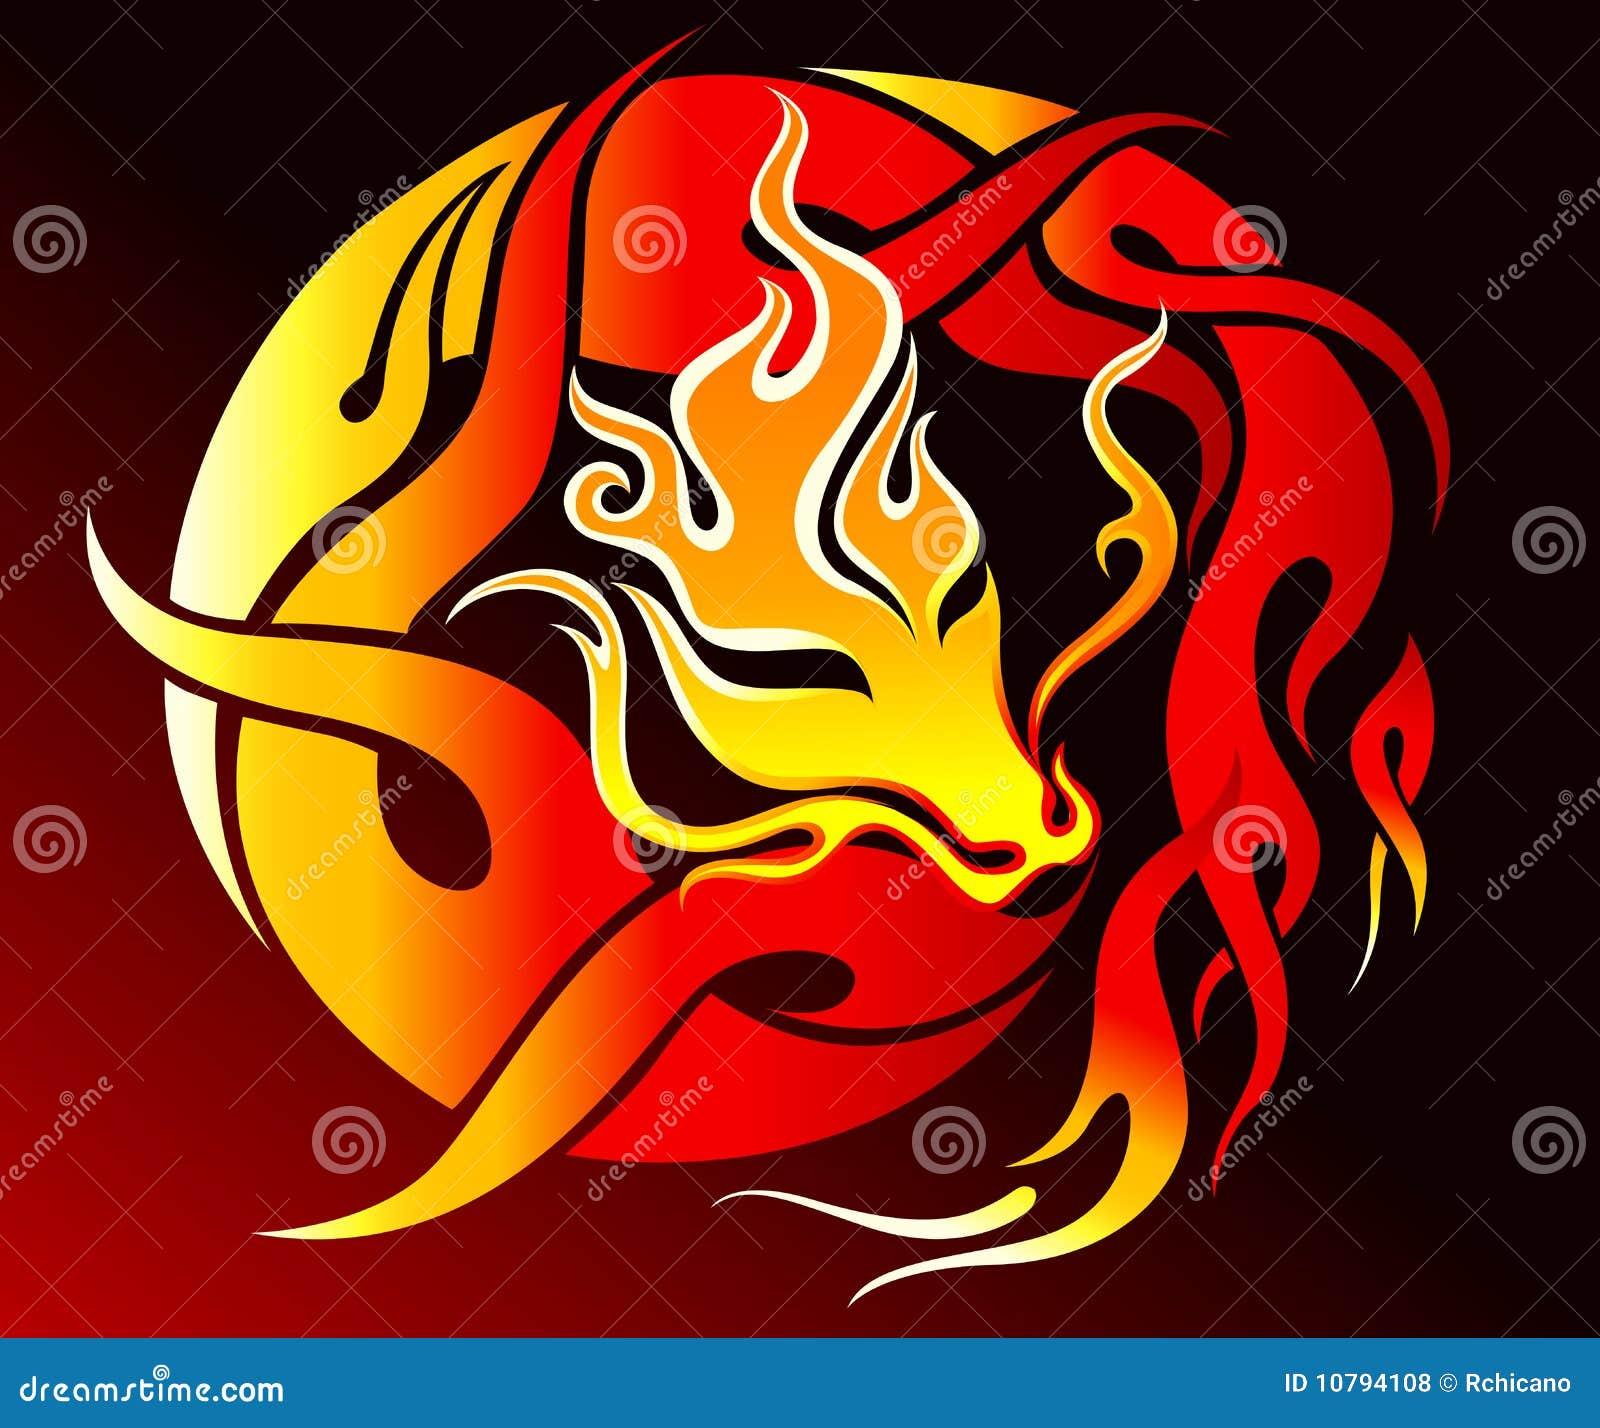 Tribal Fire Dragon